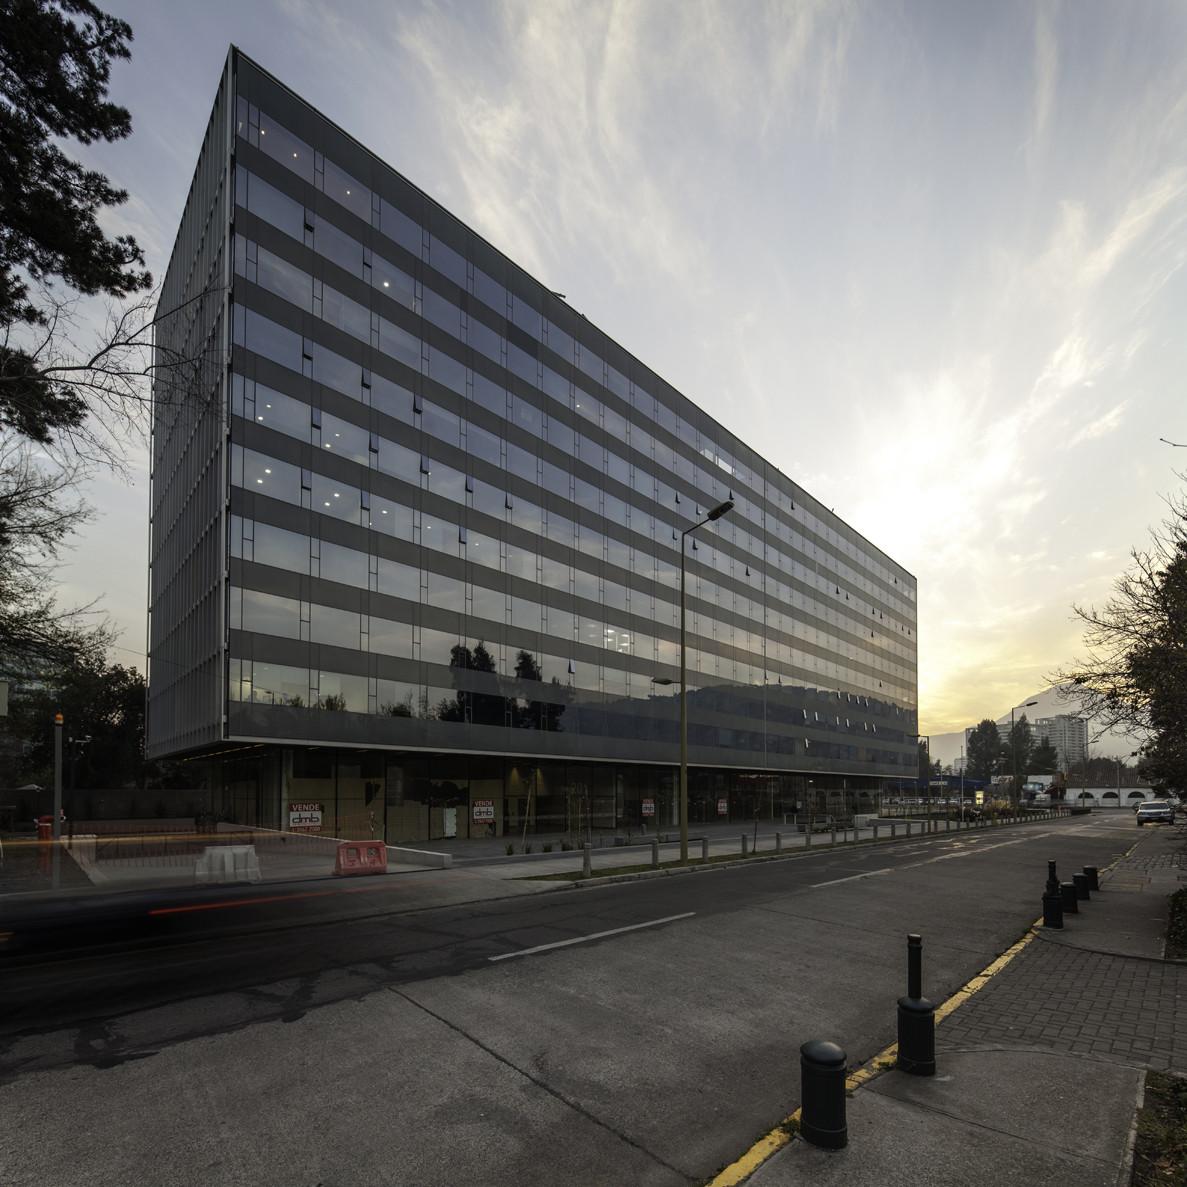 Edificio de Oficinas Lo Fontecilla / + arquitect. Image Courtesy of Bming